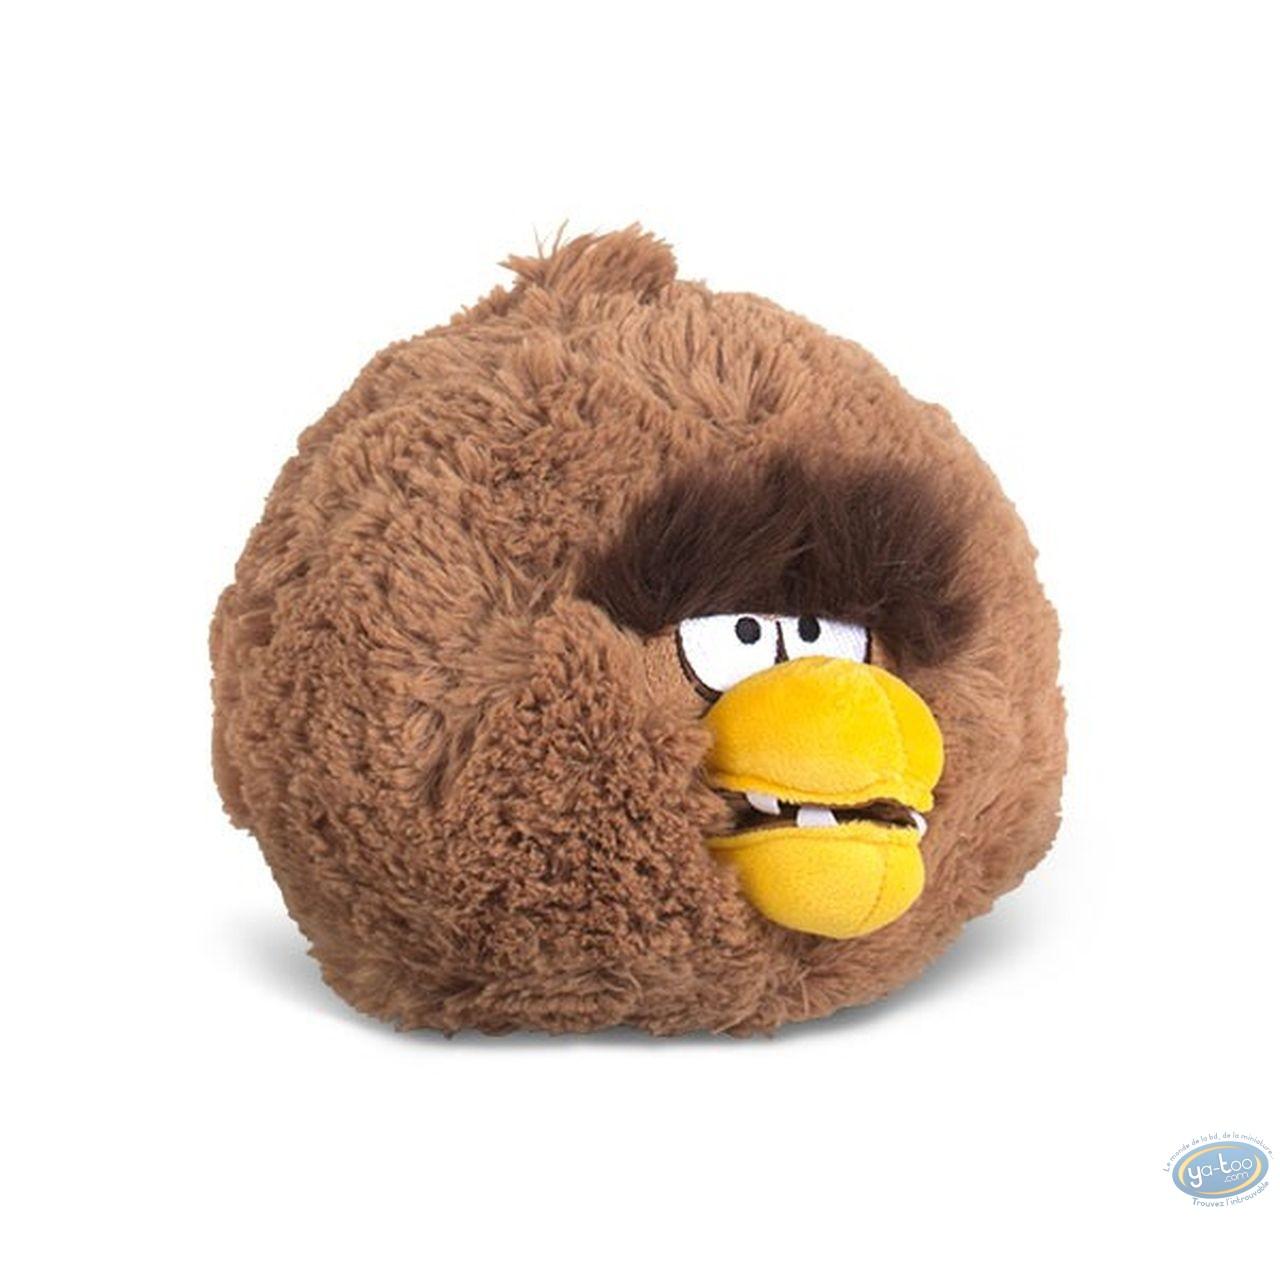 Plush, Angry-birds : Plush, Angry-birds Star Wars : Chewbacca